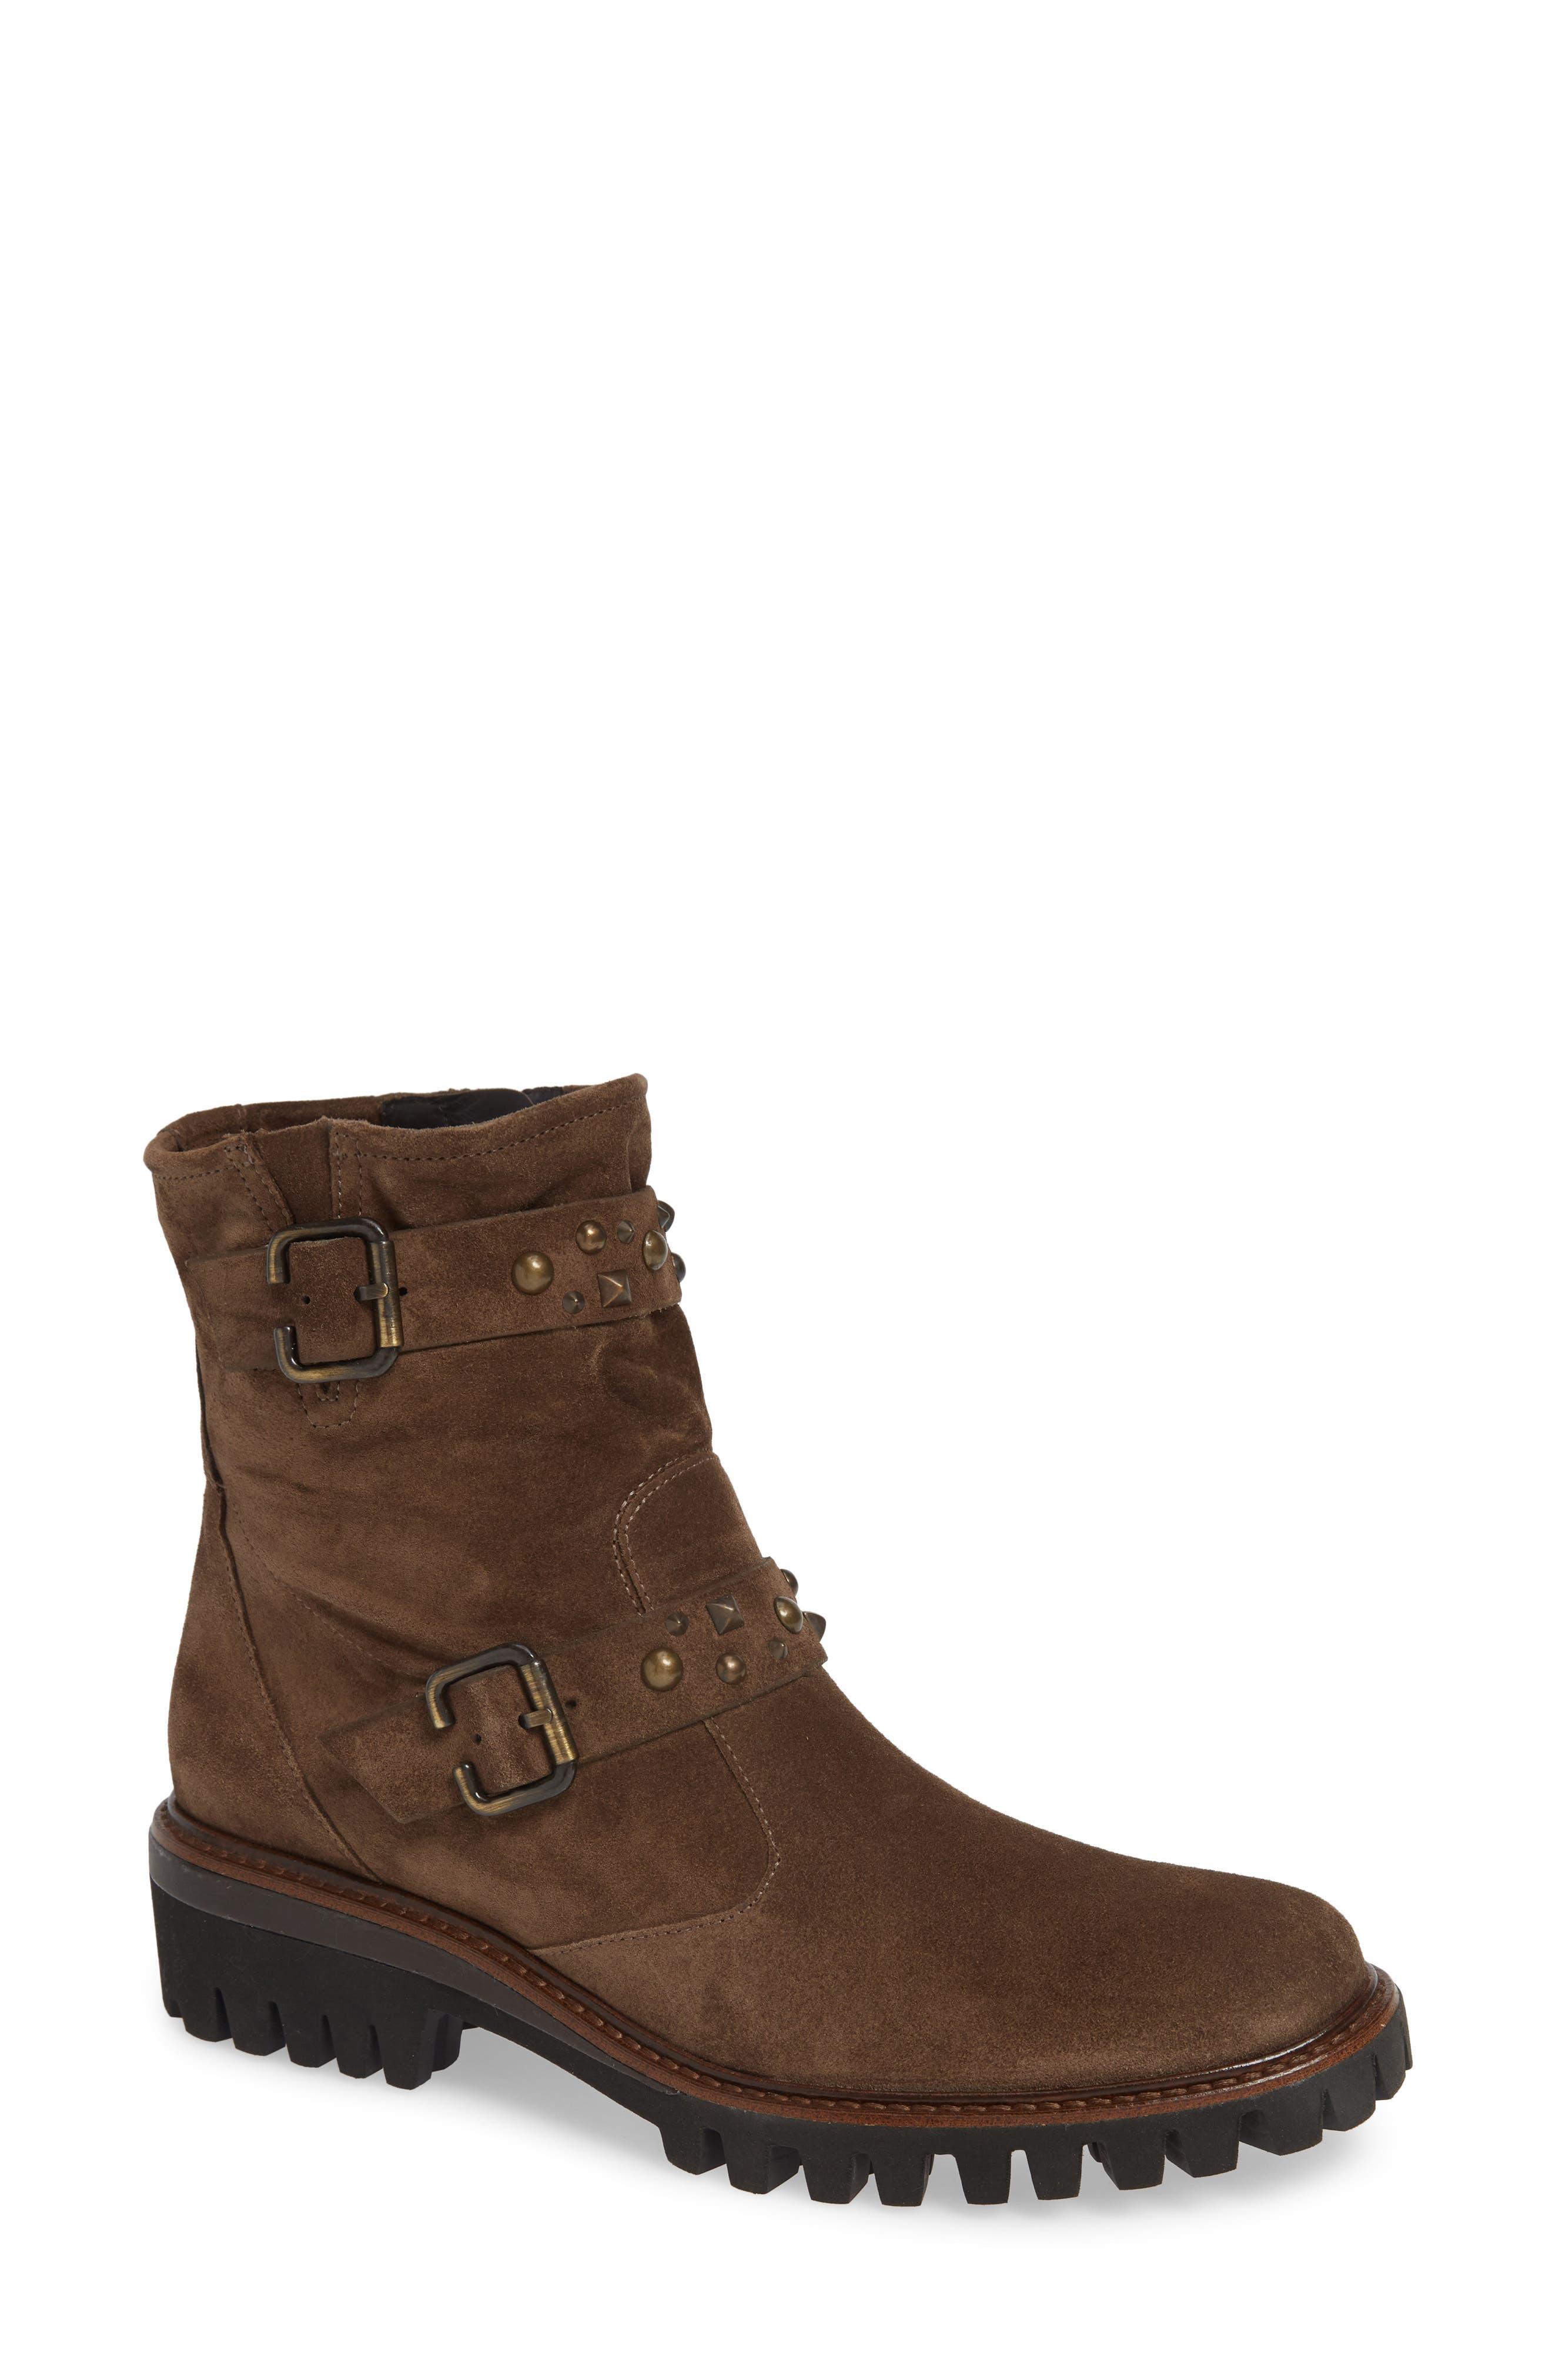 Paul Green Veronia Studded Buckle Boot, US / 4.5UK - Brown